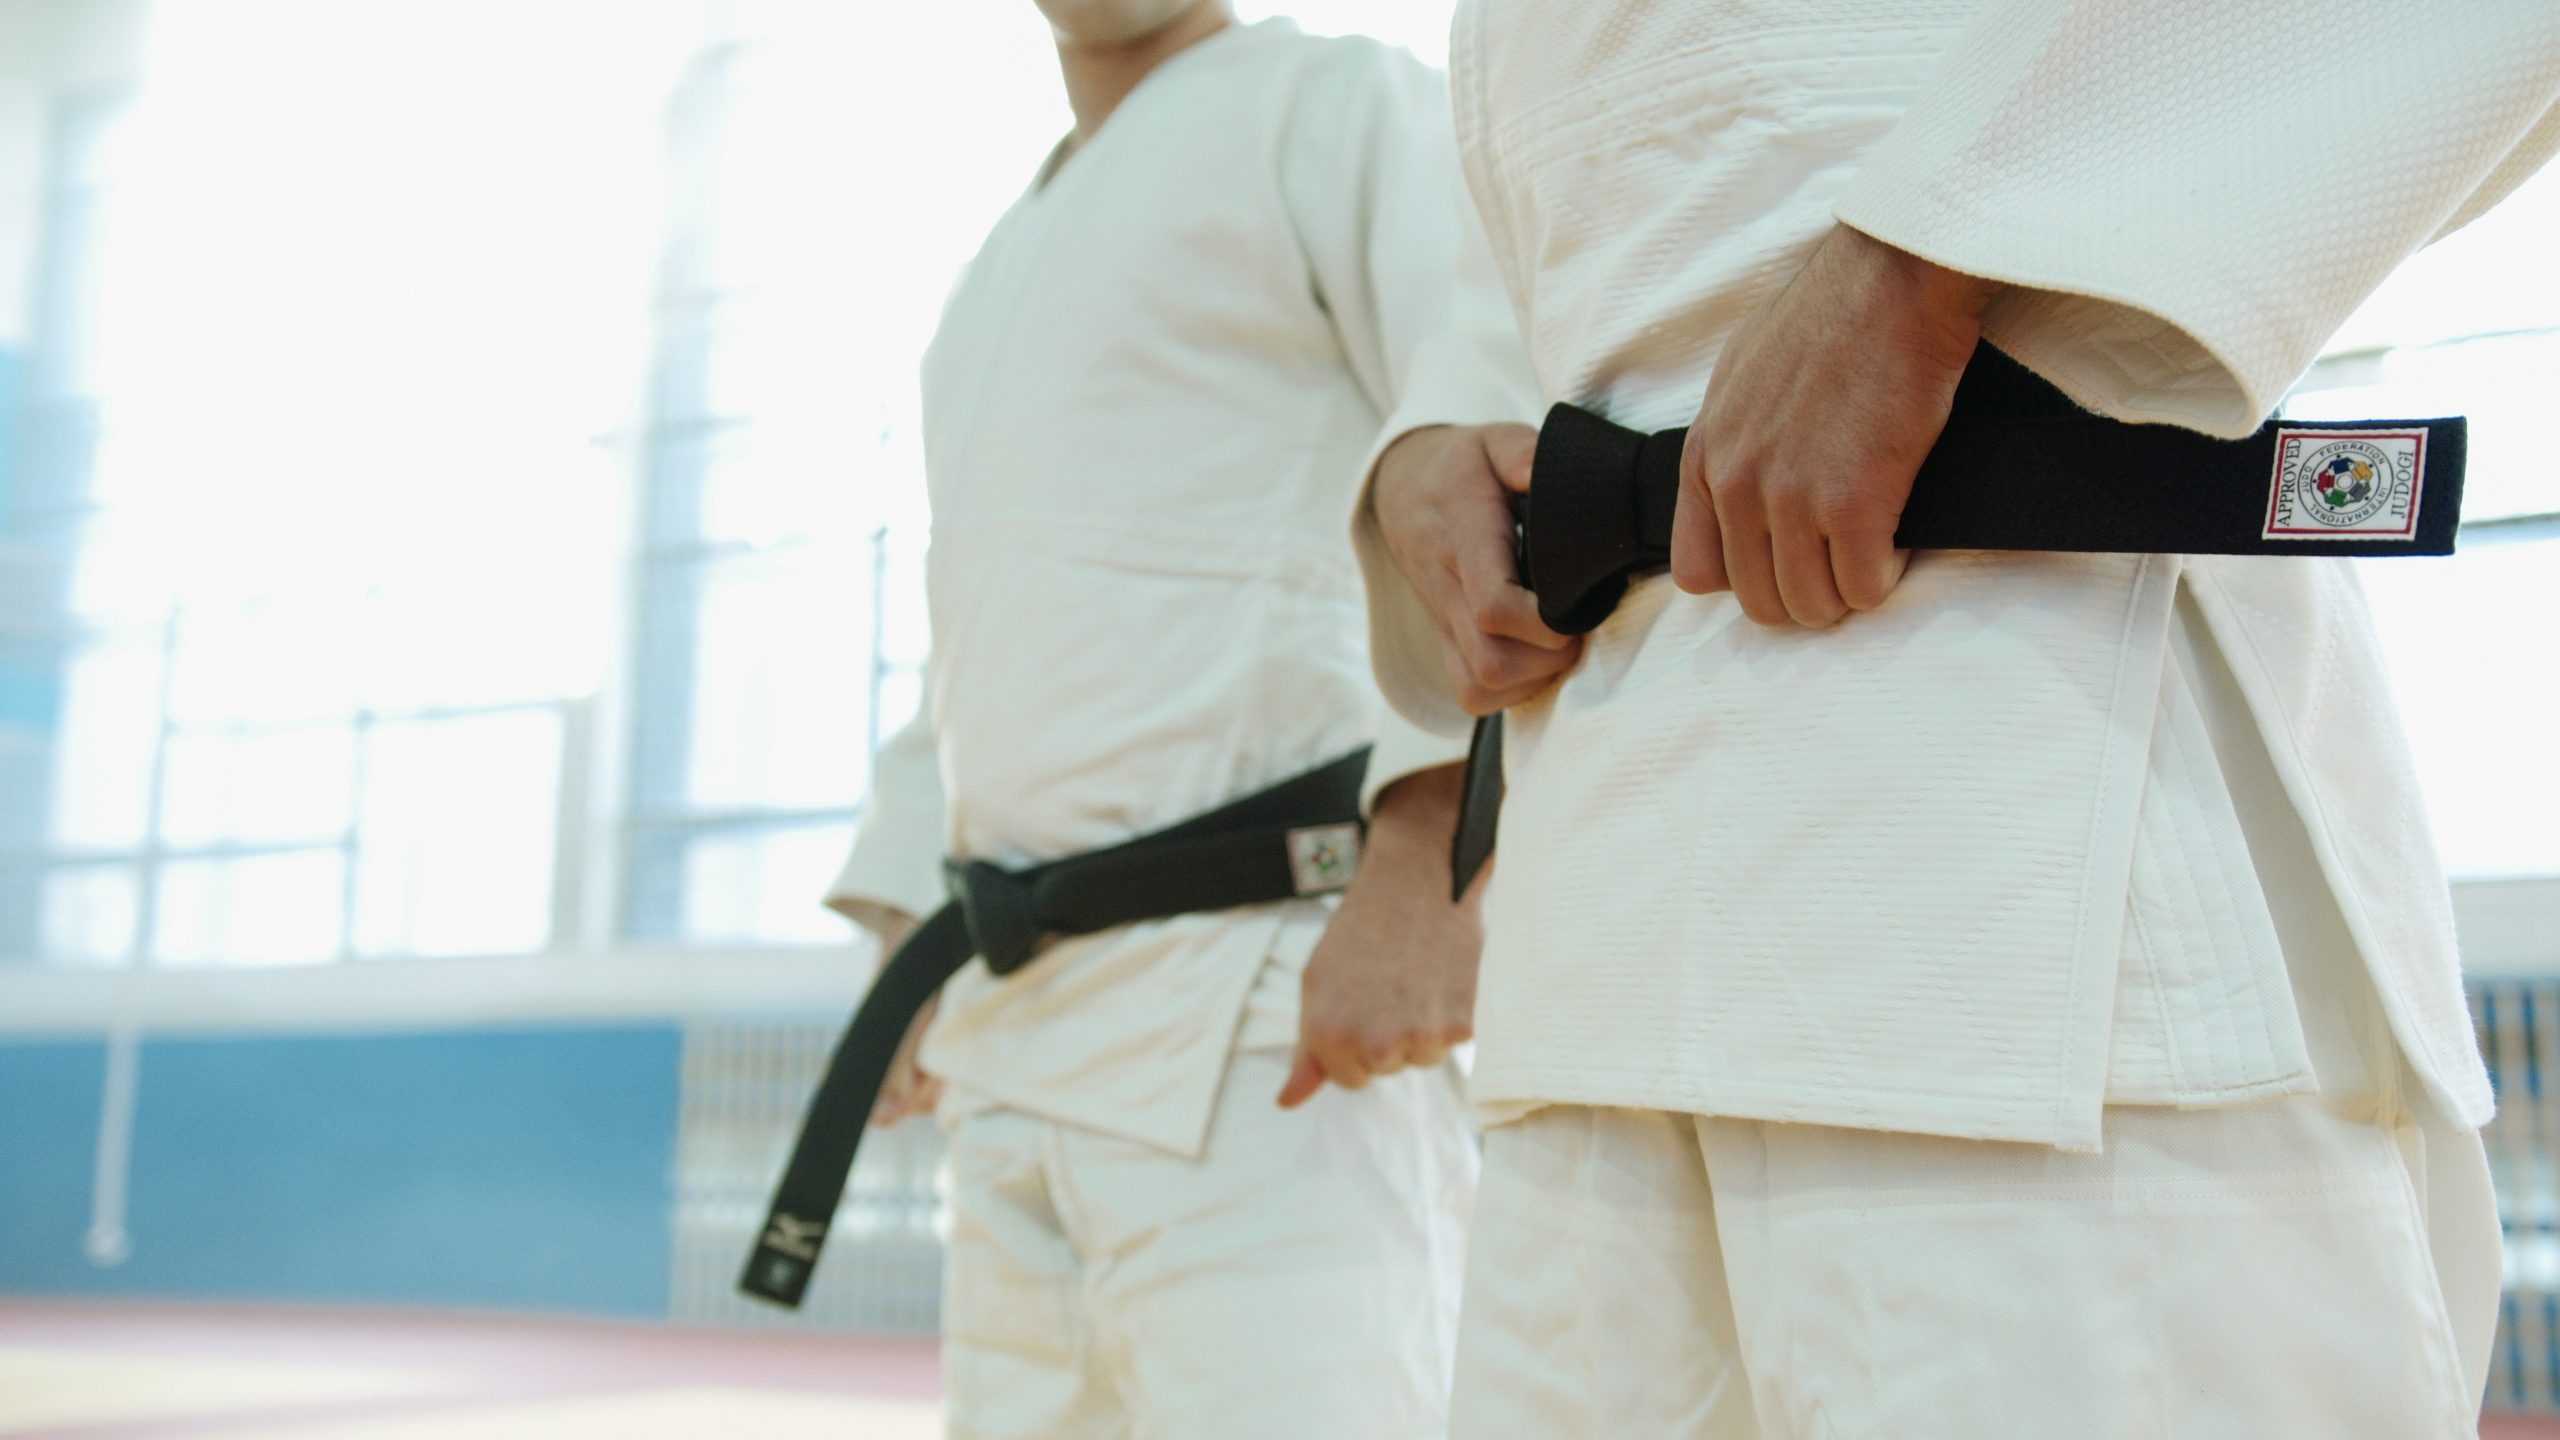 karate bologna - PGS WELCOME